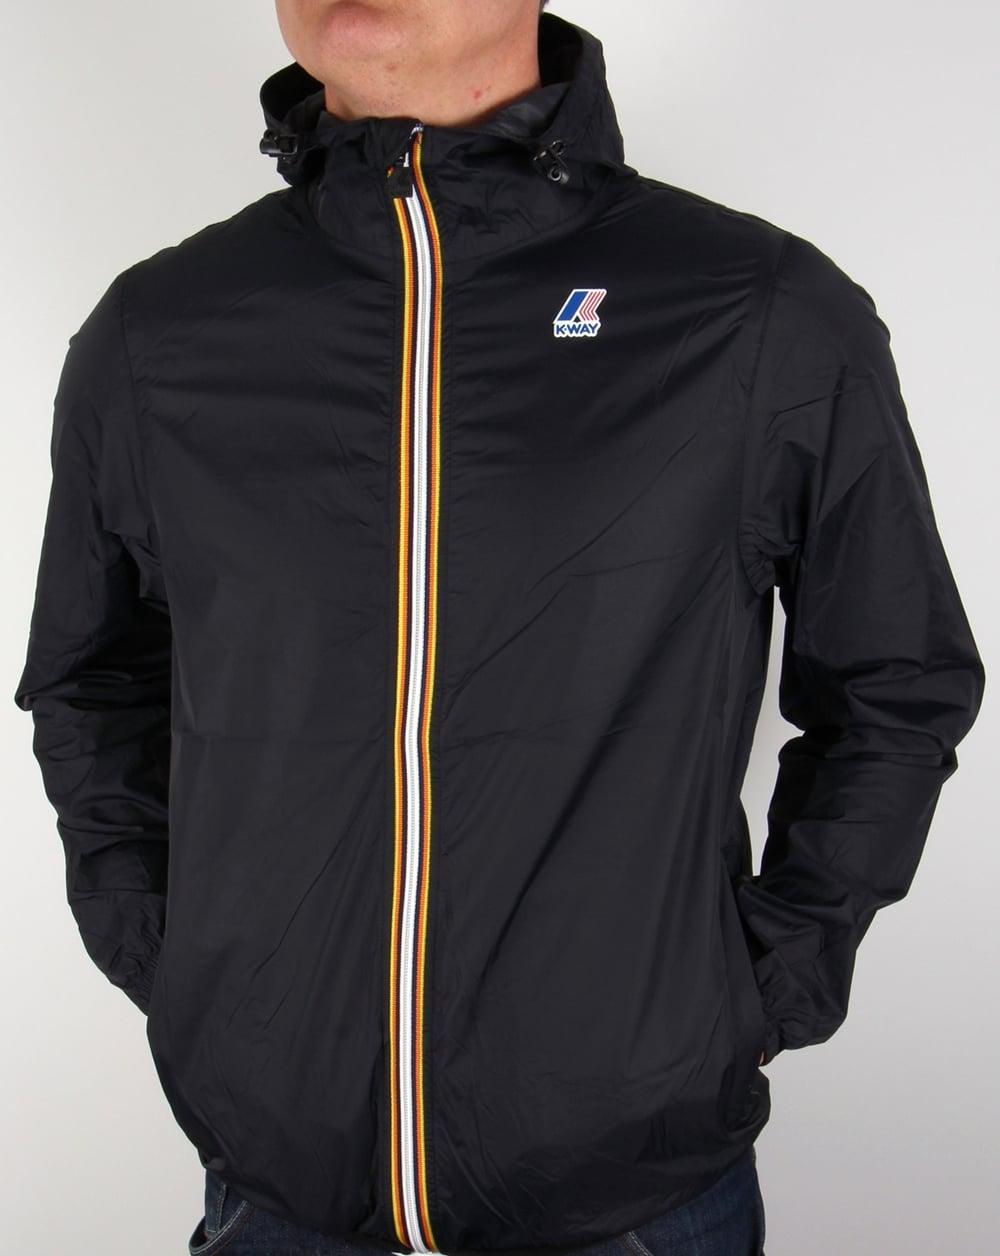 Bien connu K-way Claude 3.0 Rainproof Jacket Black,windbreaker,coat,pac a mac  KG33